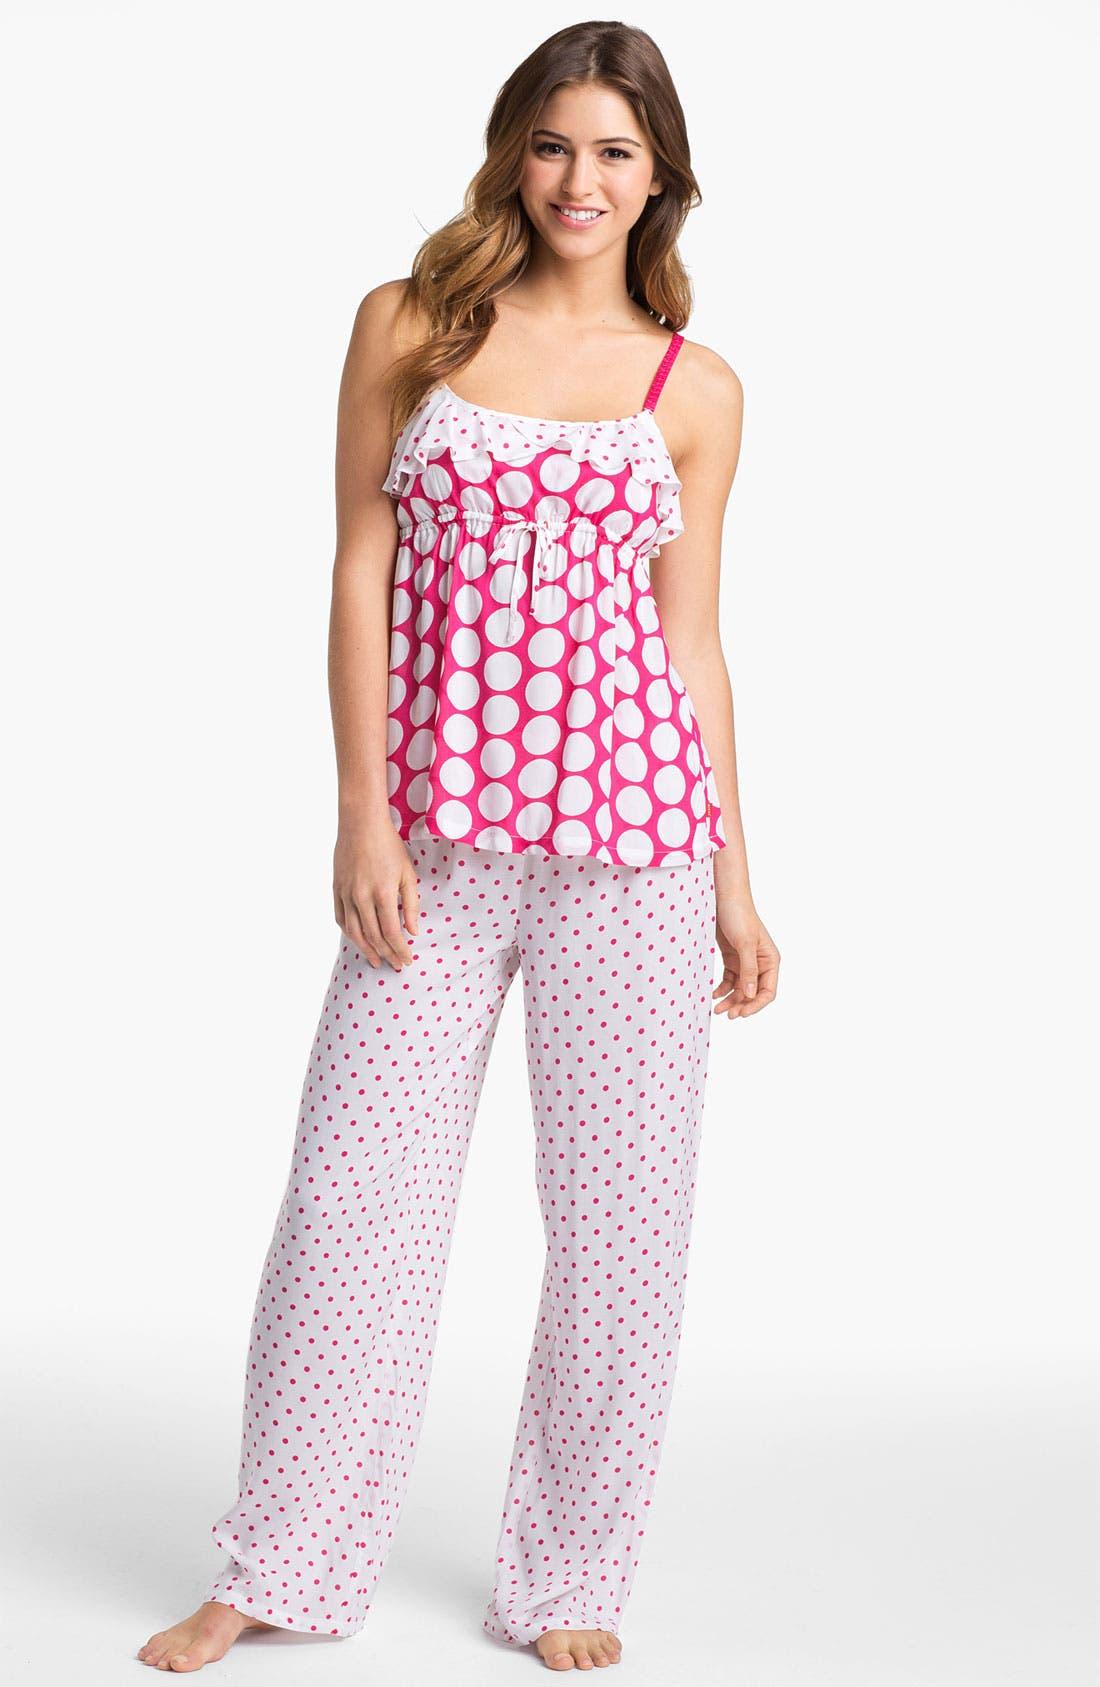 Alternate Image 1 Selected - Josie Dotted Pajamas